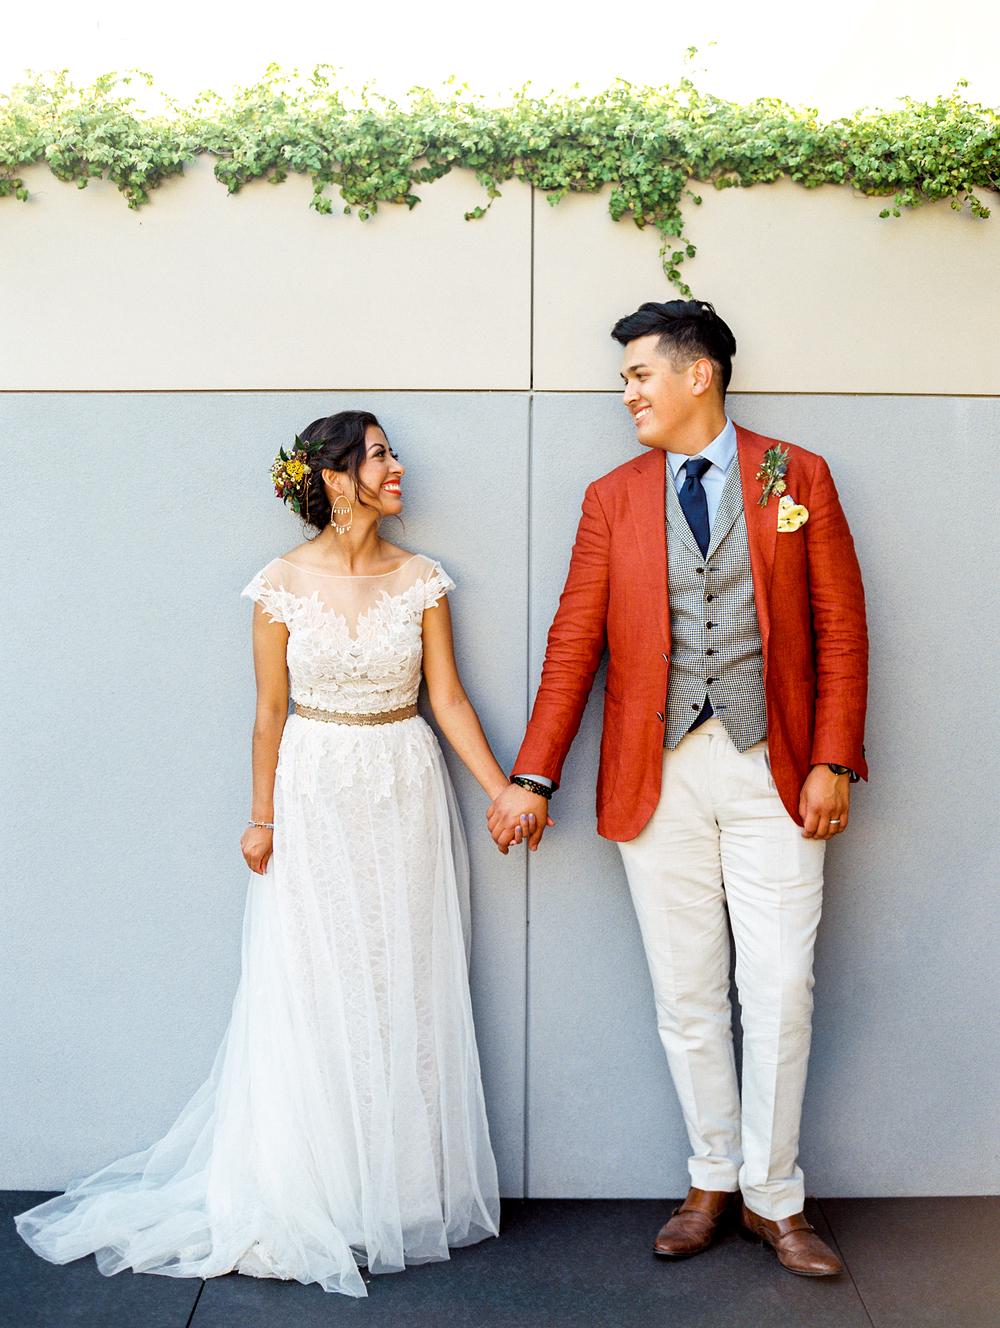 Dana-Fernandez-Photography-Martha-Stewart-Weddings-Houston-Texas-Wedding-Photographer-Film-44.jpg